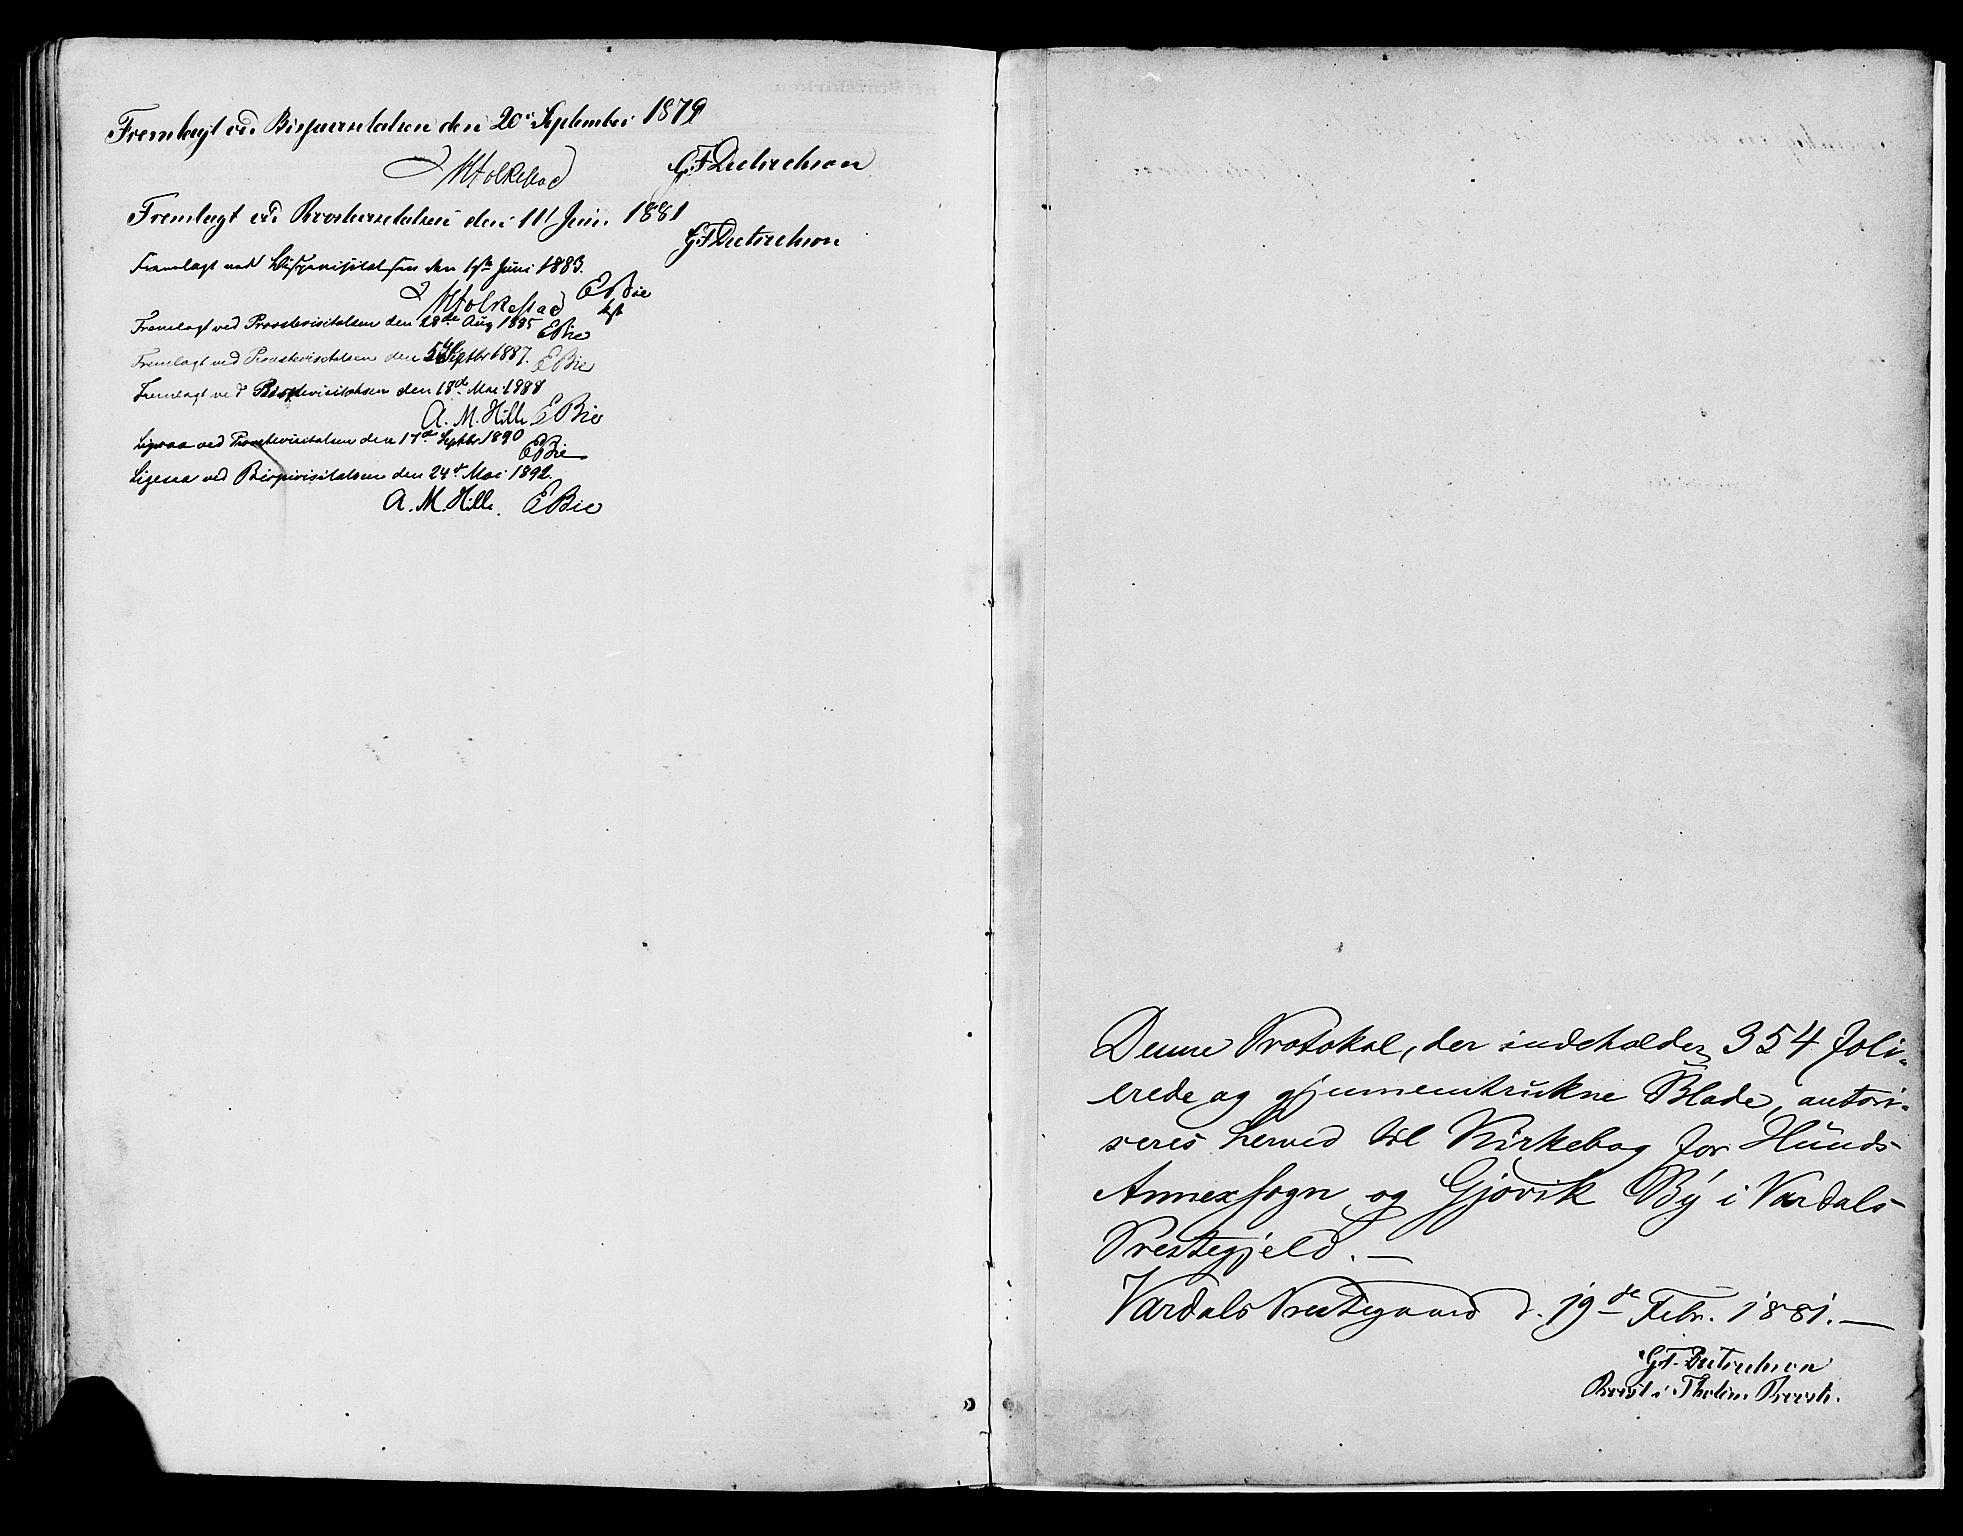 SAH, Vardal prestekontor, H/Ha/Haa/L0008: Ministerialbok nr. 8, 1878-1890